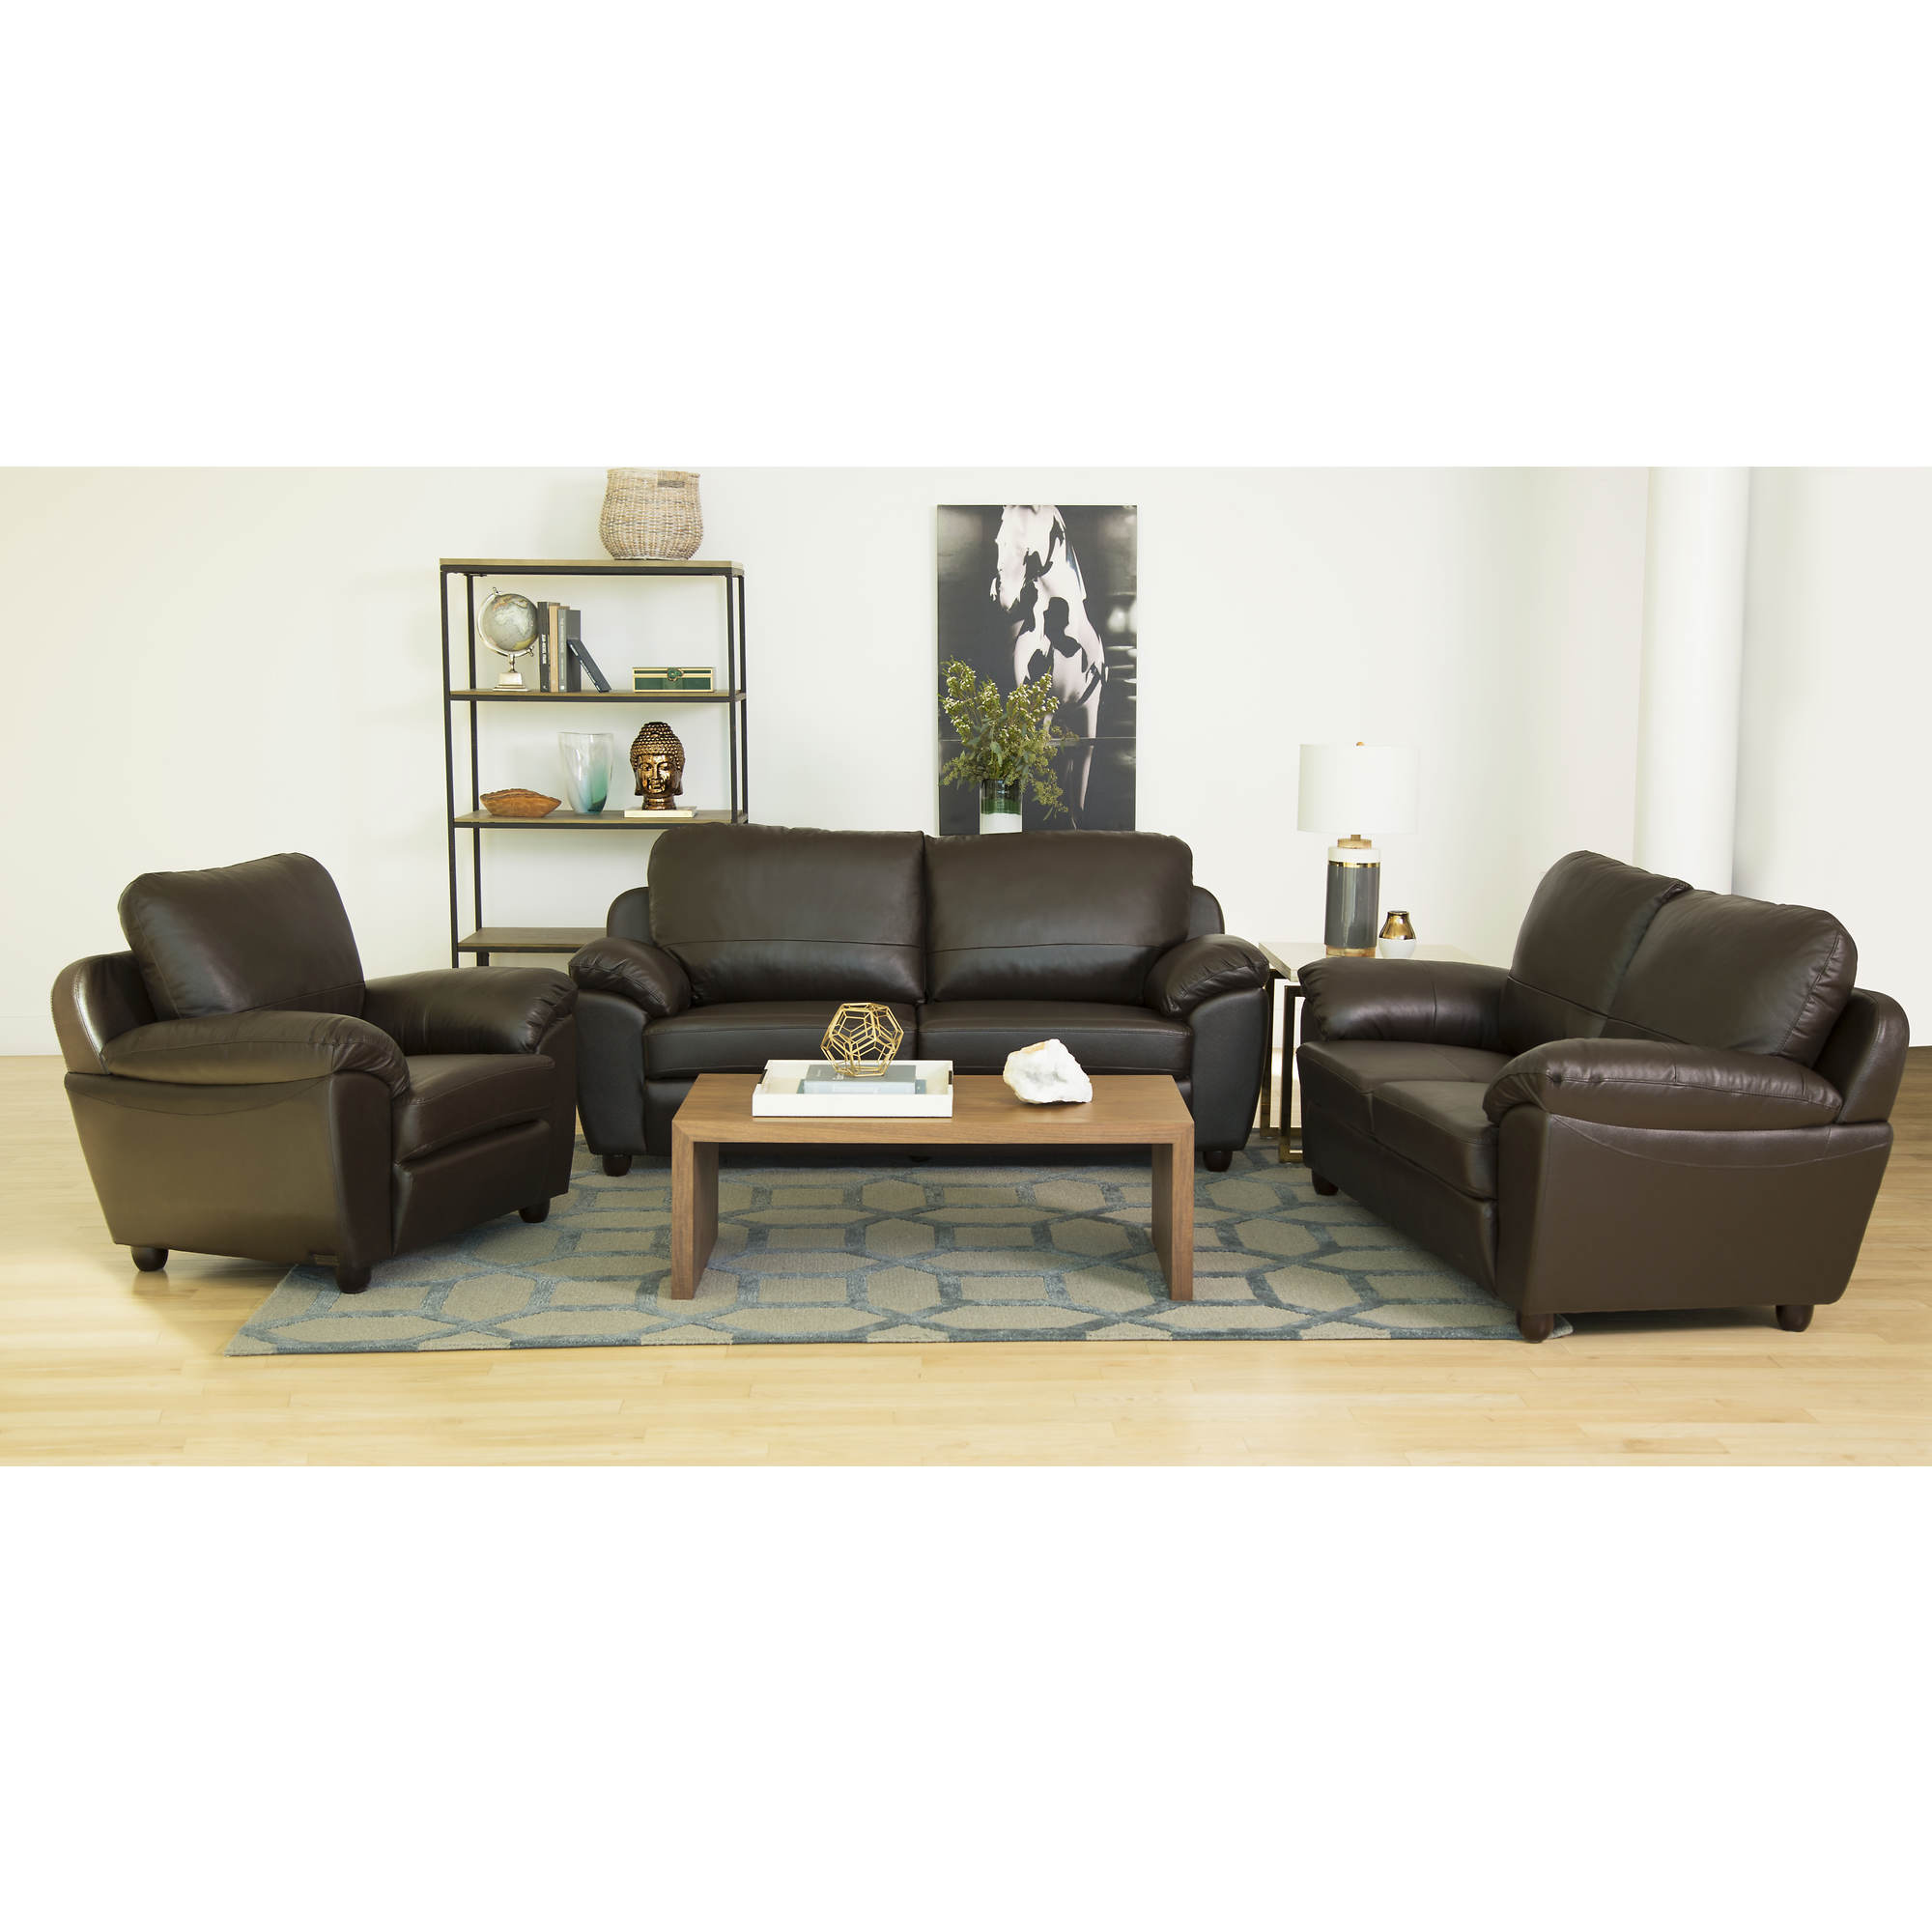 Italian Living Room Furniture Sets: Italian Leather Living Room Sets